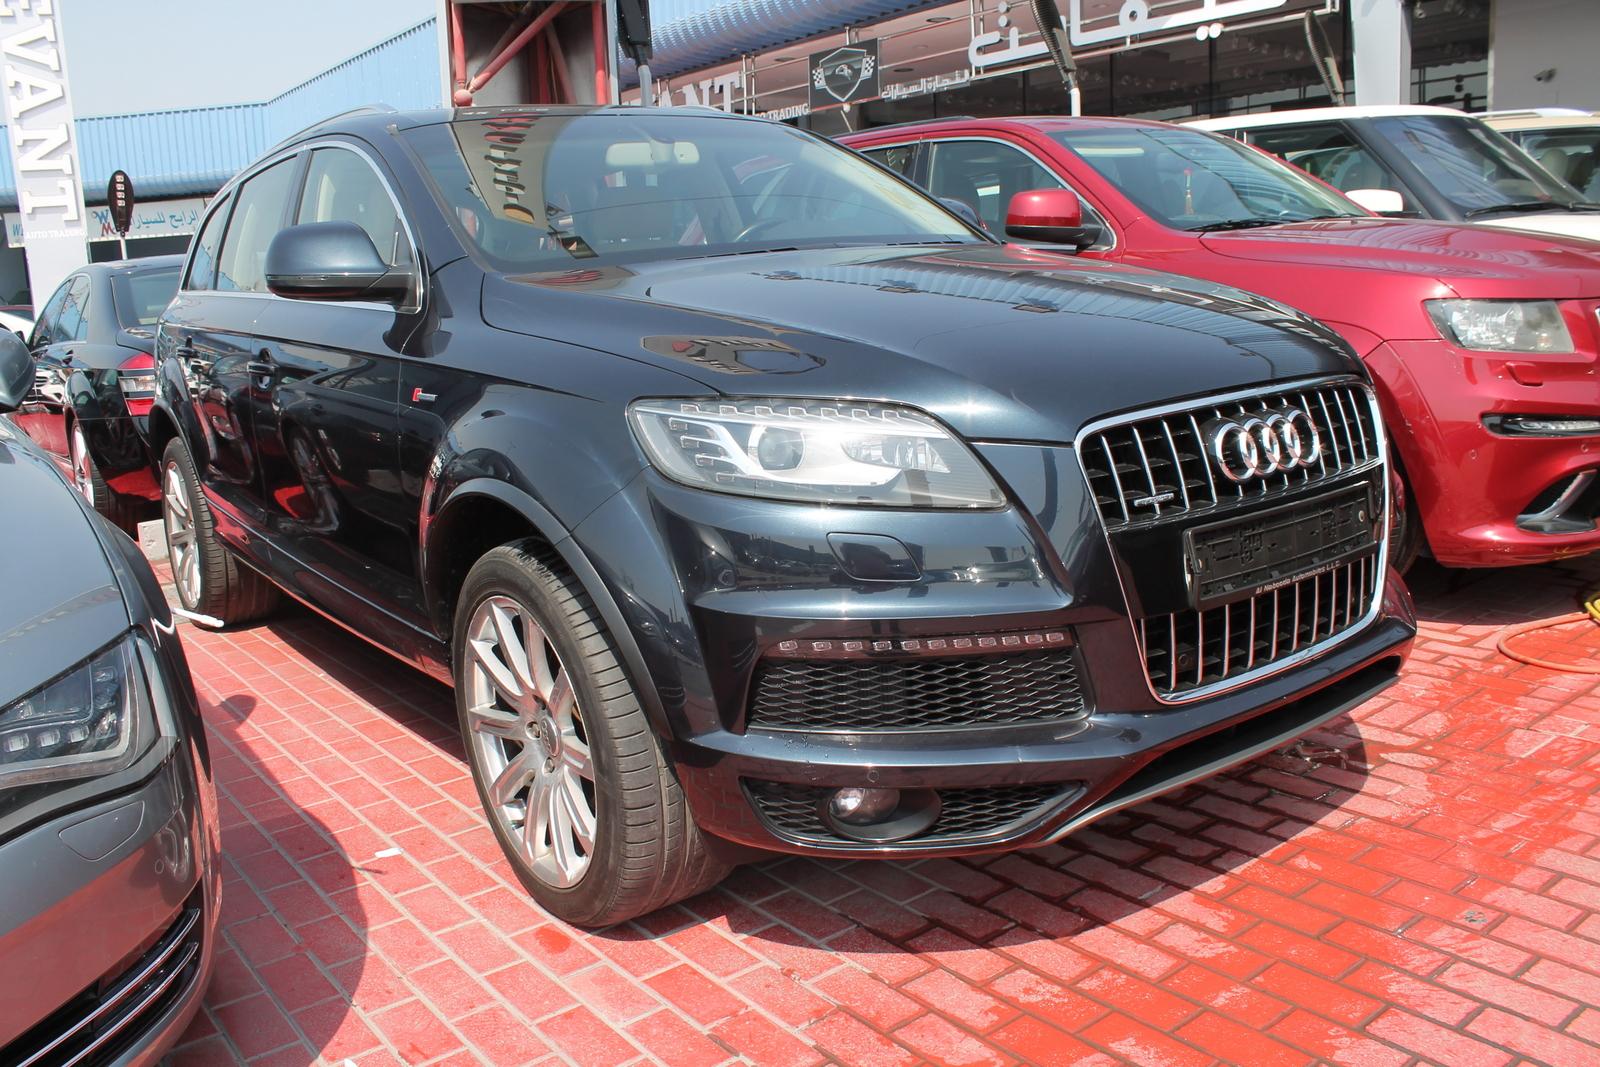 used audi q7 2011 car for sale in dubai 753190. Black Bedroom Furniture Sets. Home Design Ideas